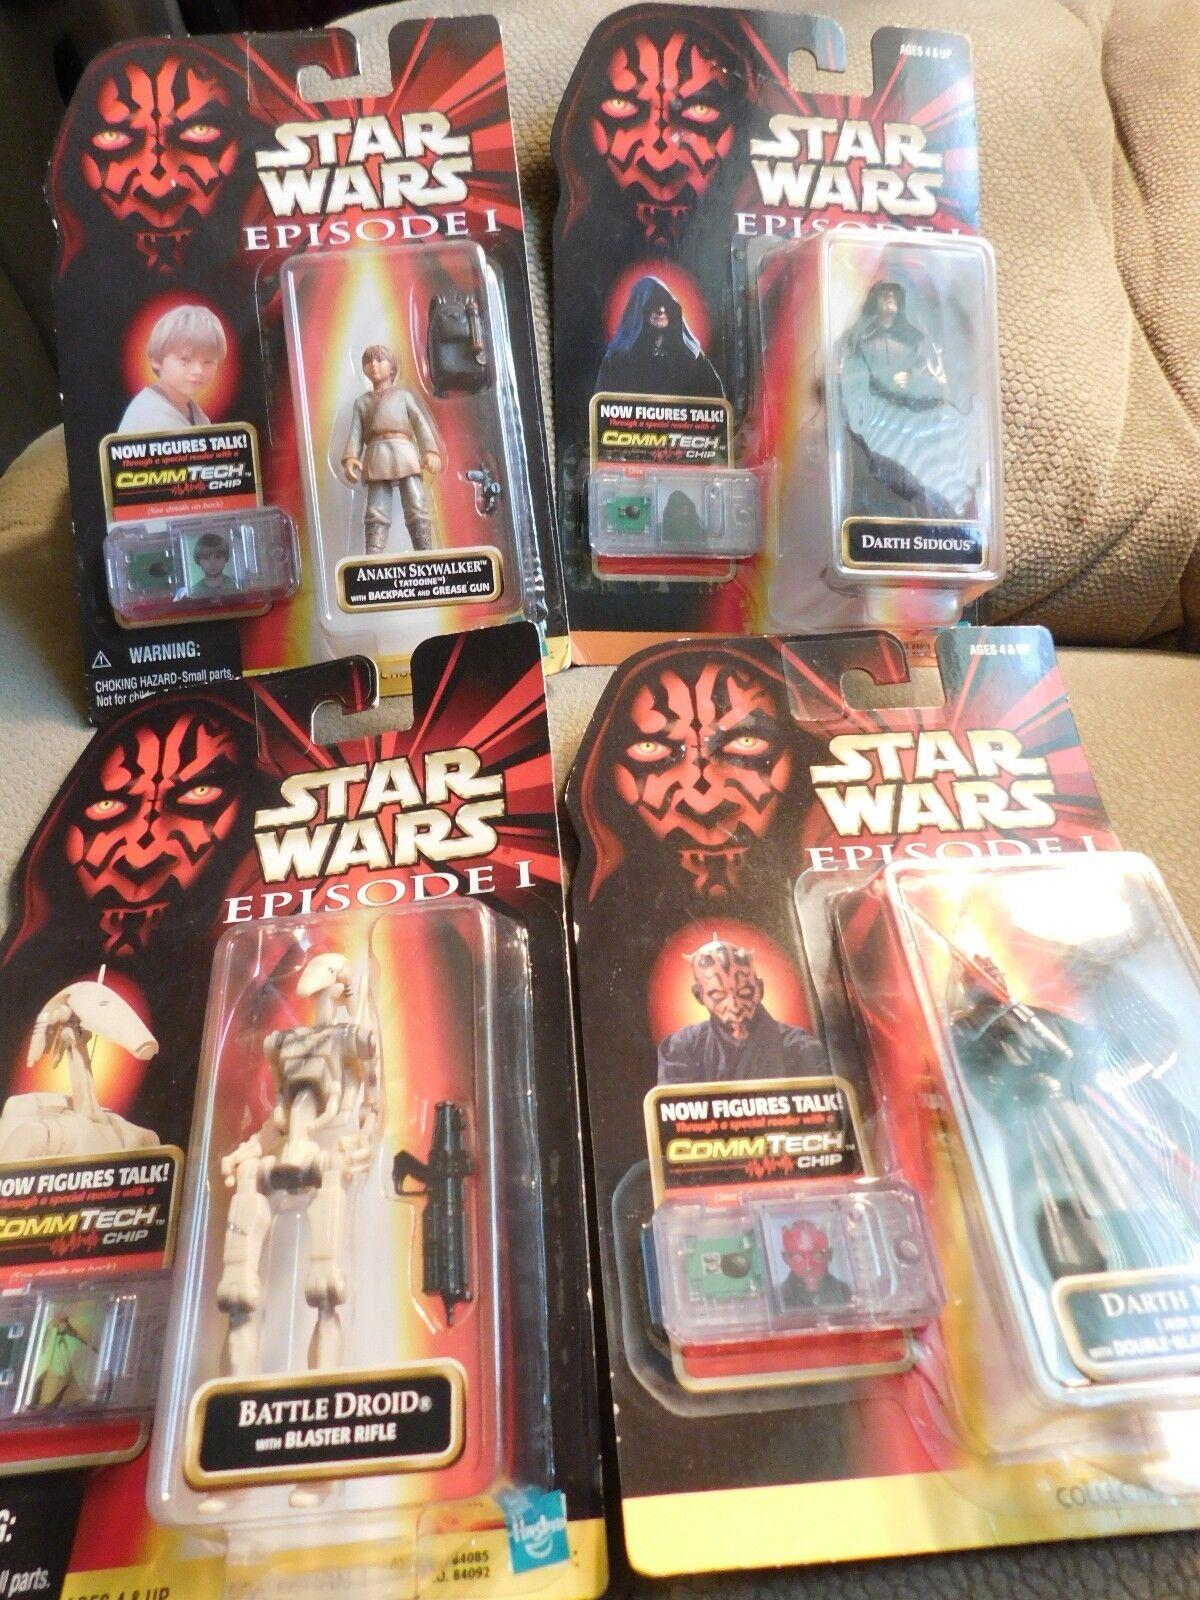 Star Wars Episode I 1998 Hasbro Lot of 4 Action FiguresBrand NewFree Shipping